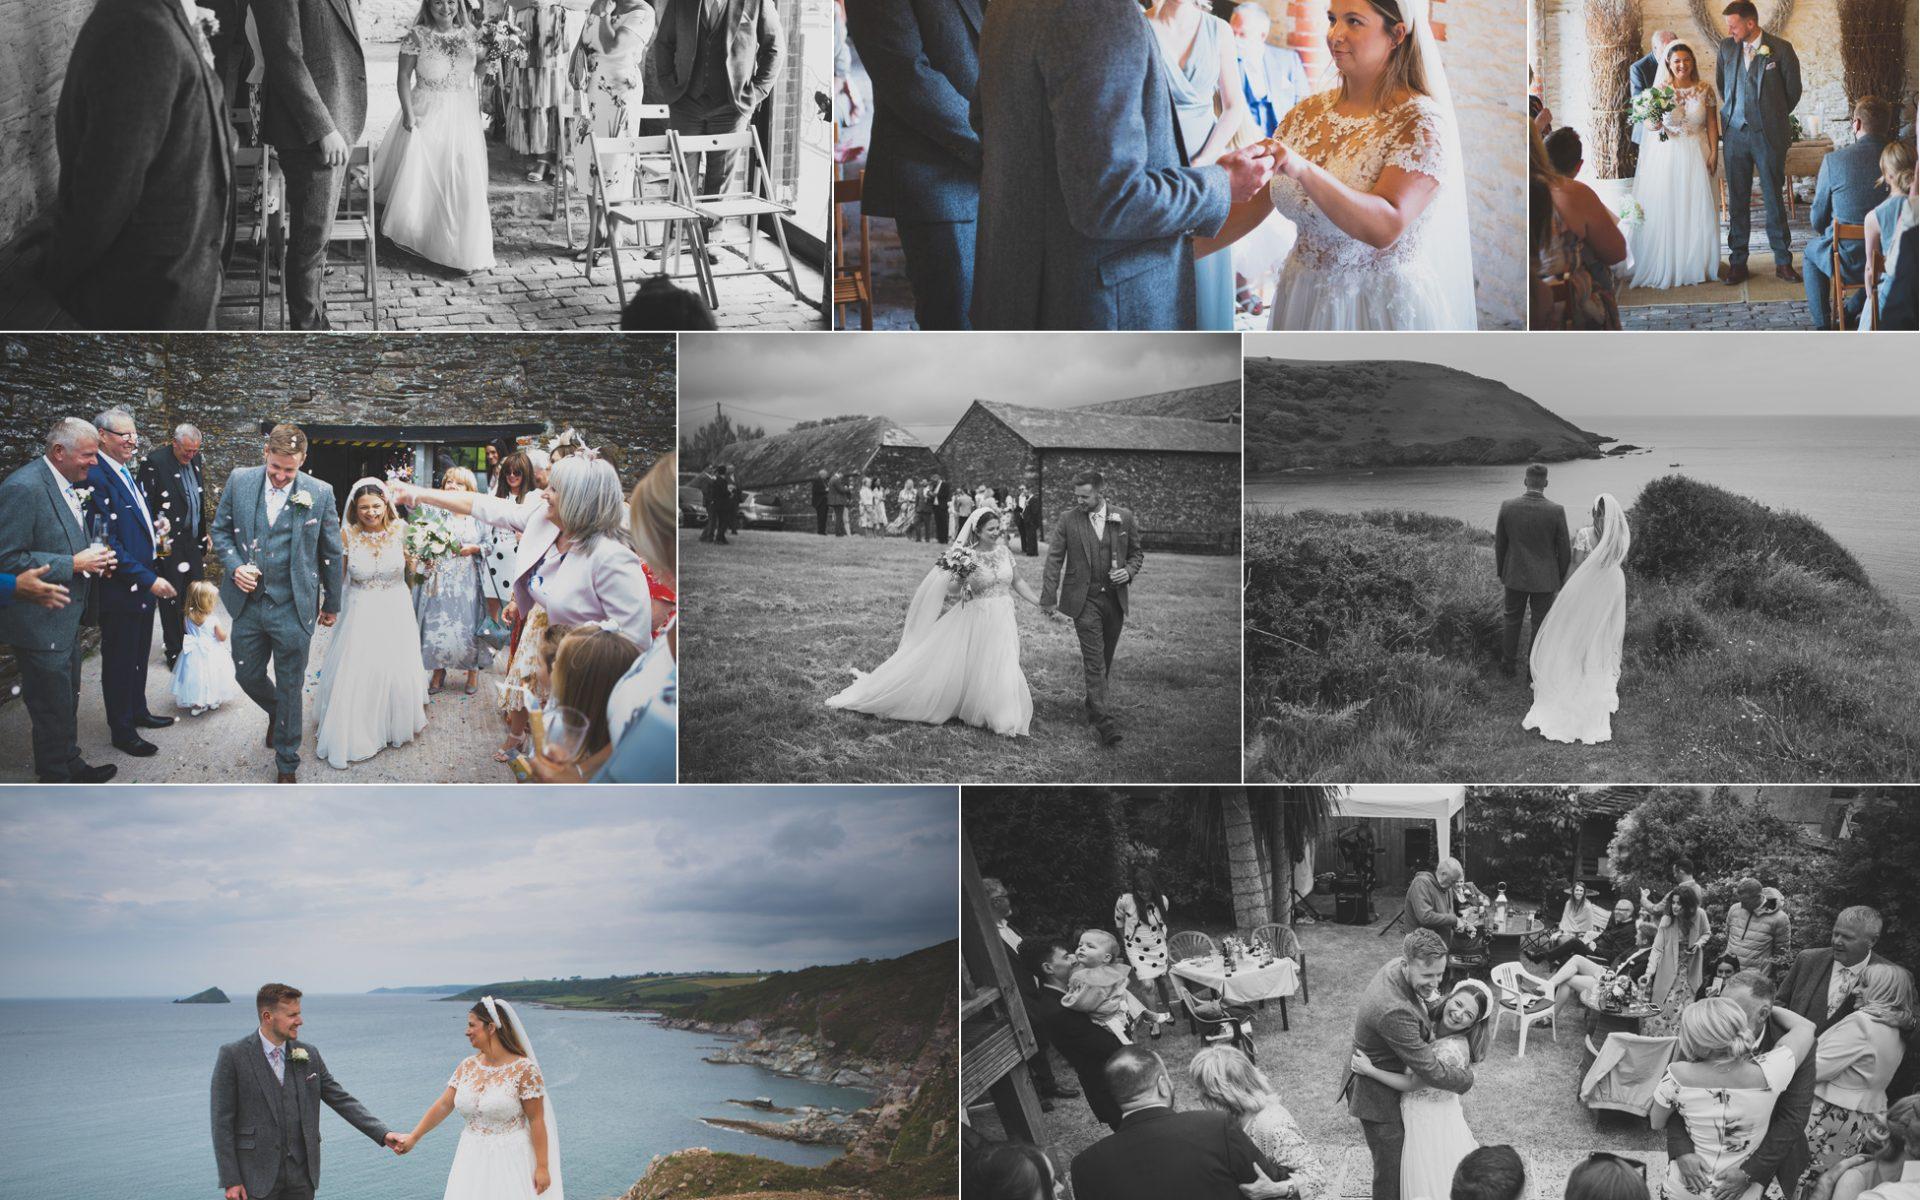 Leah & Scott - Devon Wedding, New Barton Barns